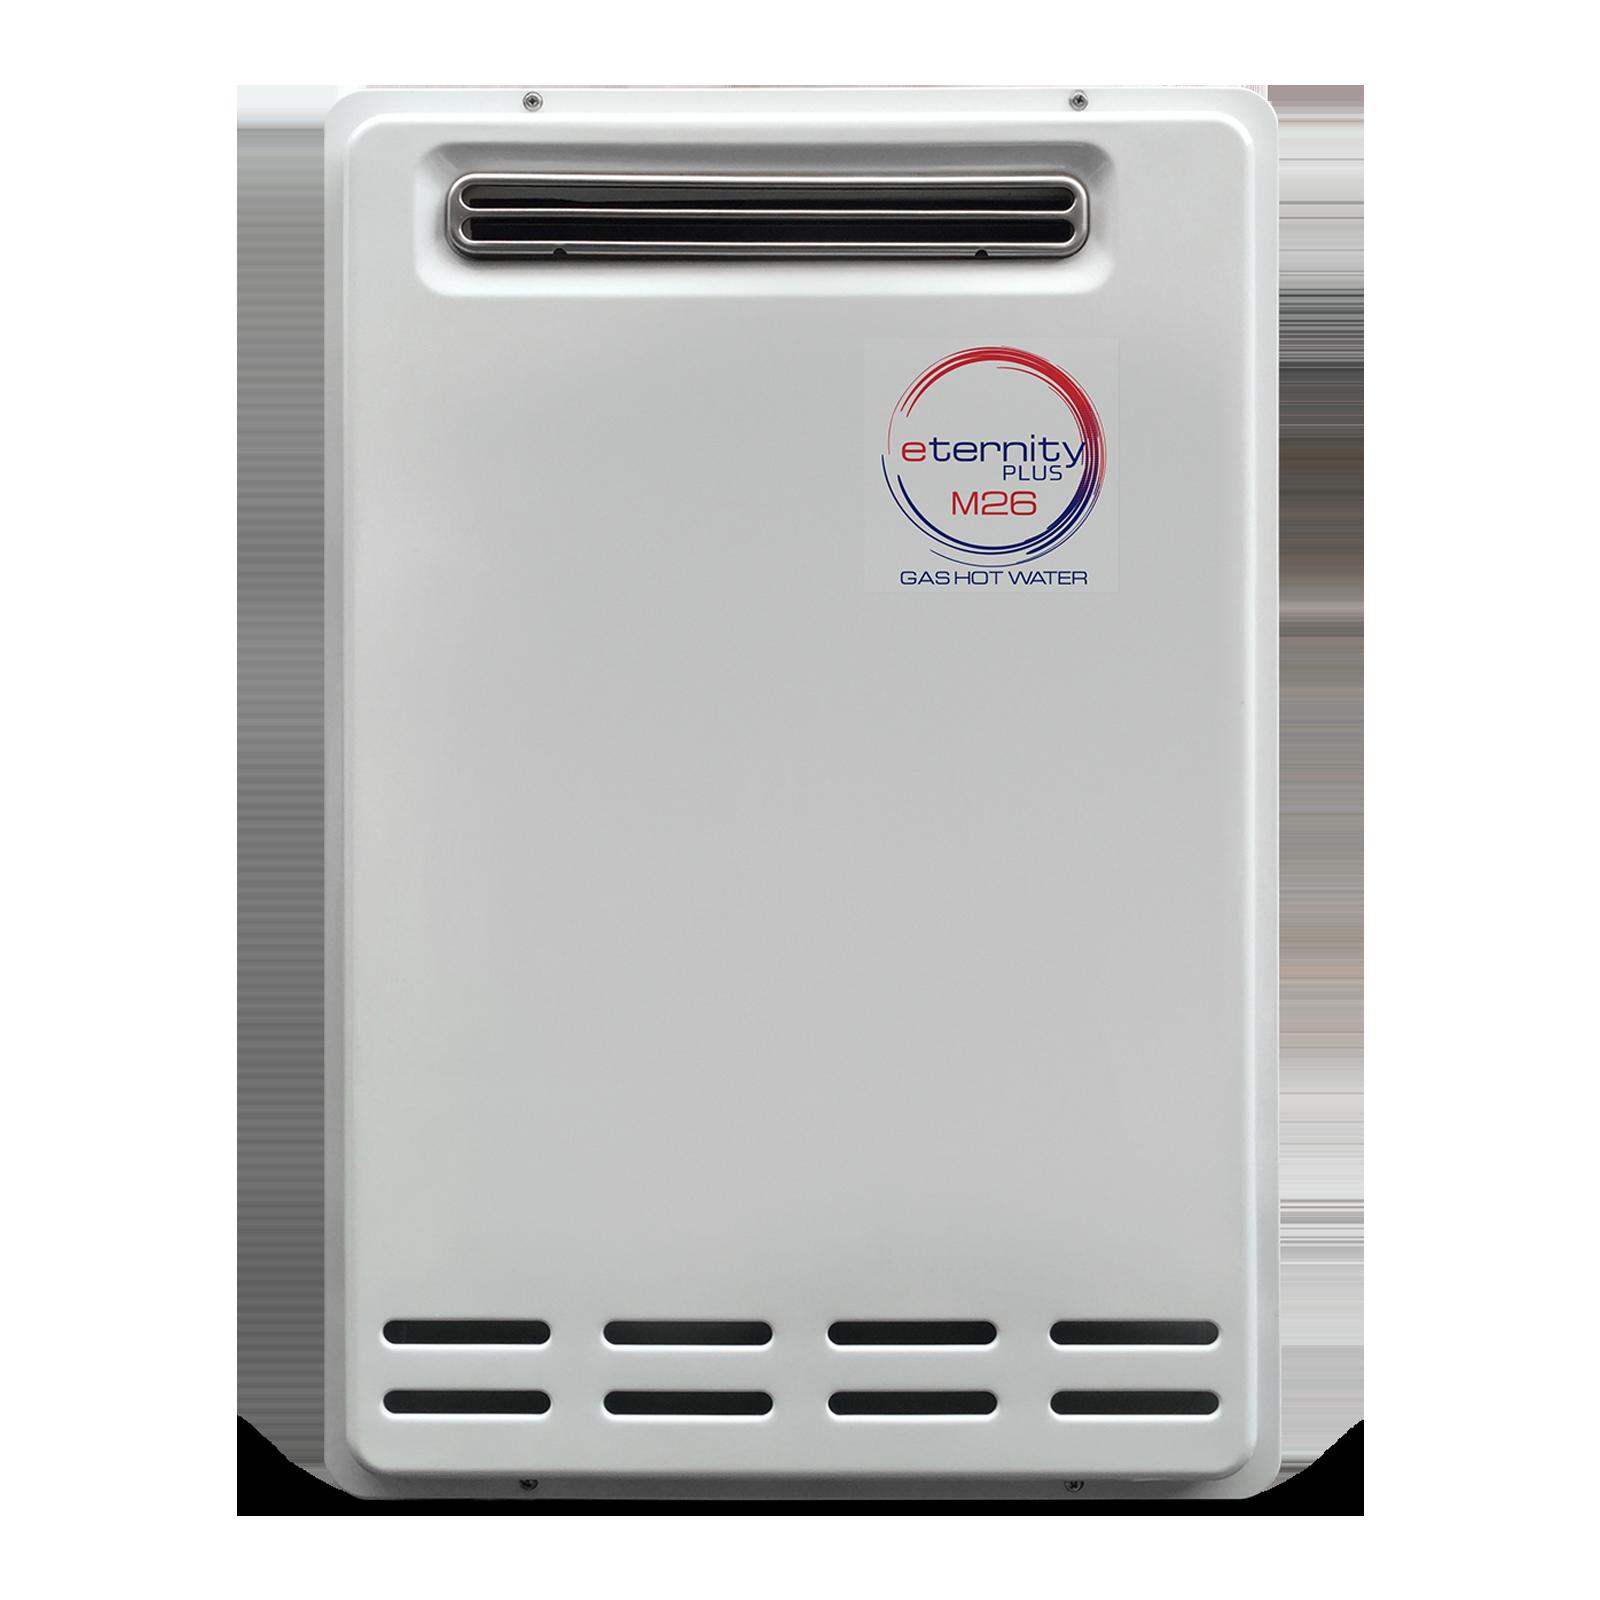 Chromagen Eternity Plus 26L Continuous Flow Hot Water Heater - Natural Gas